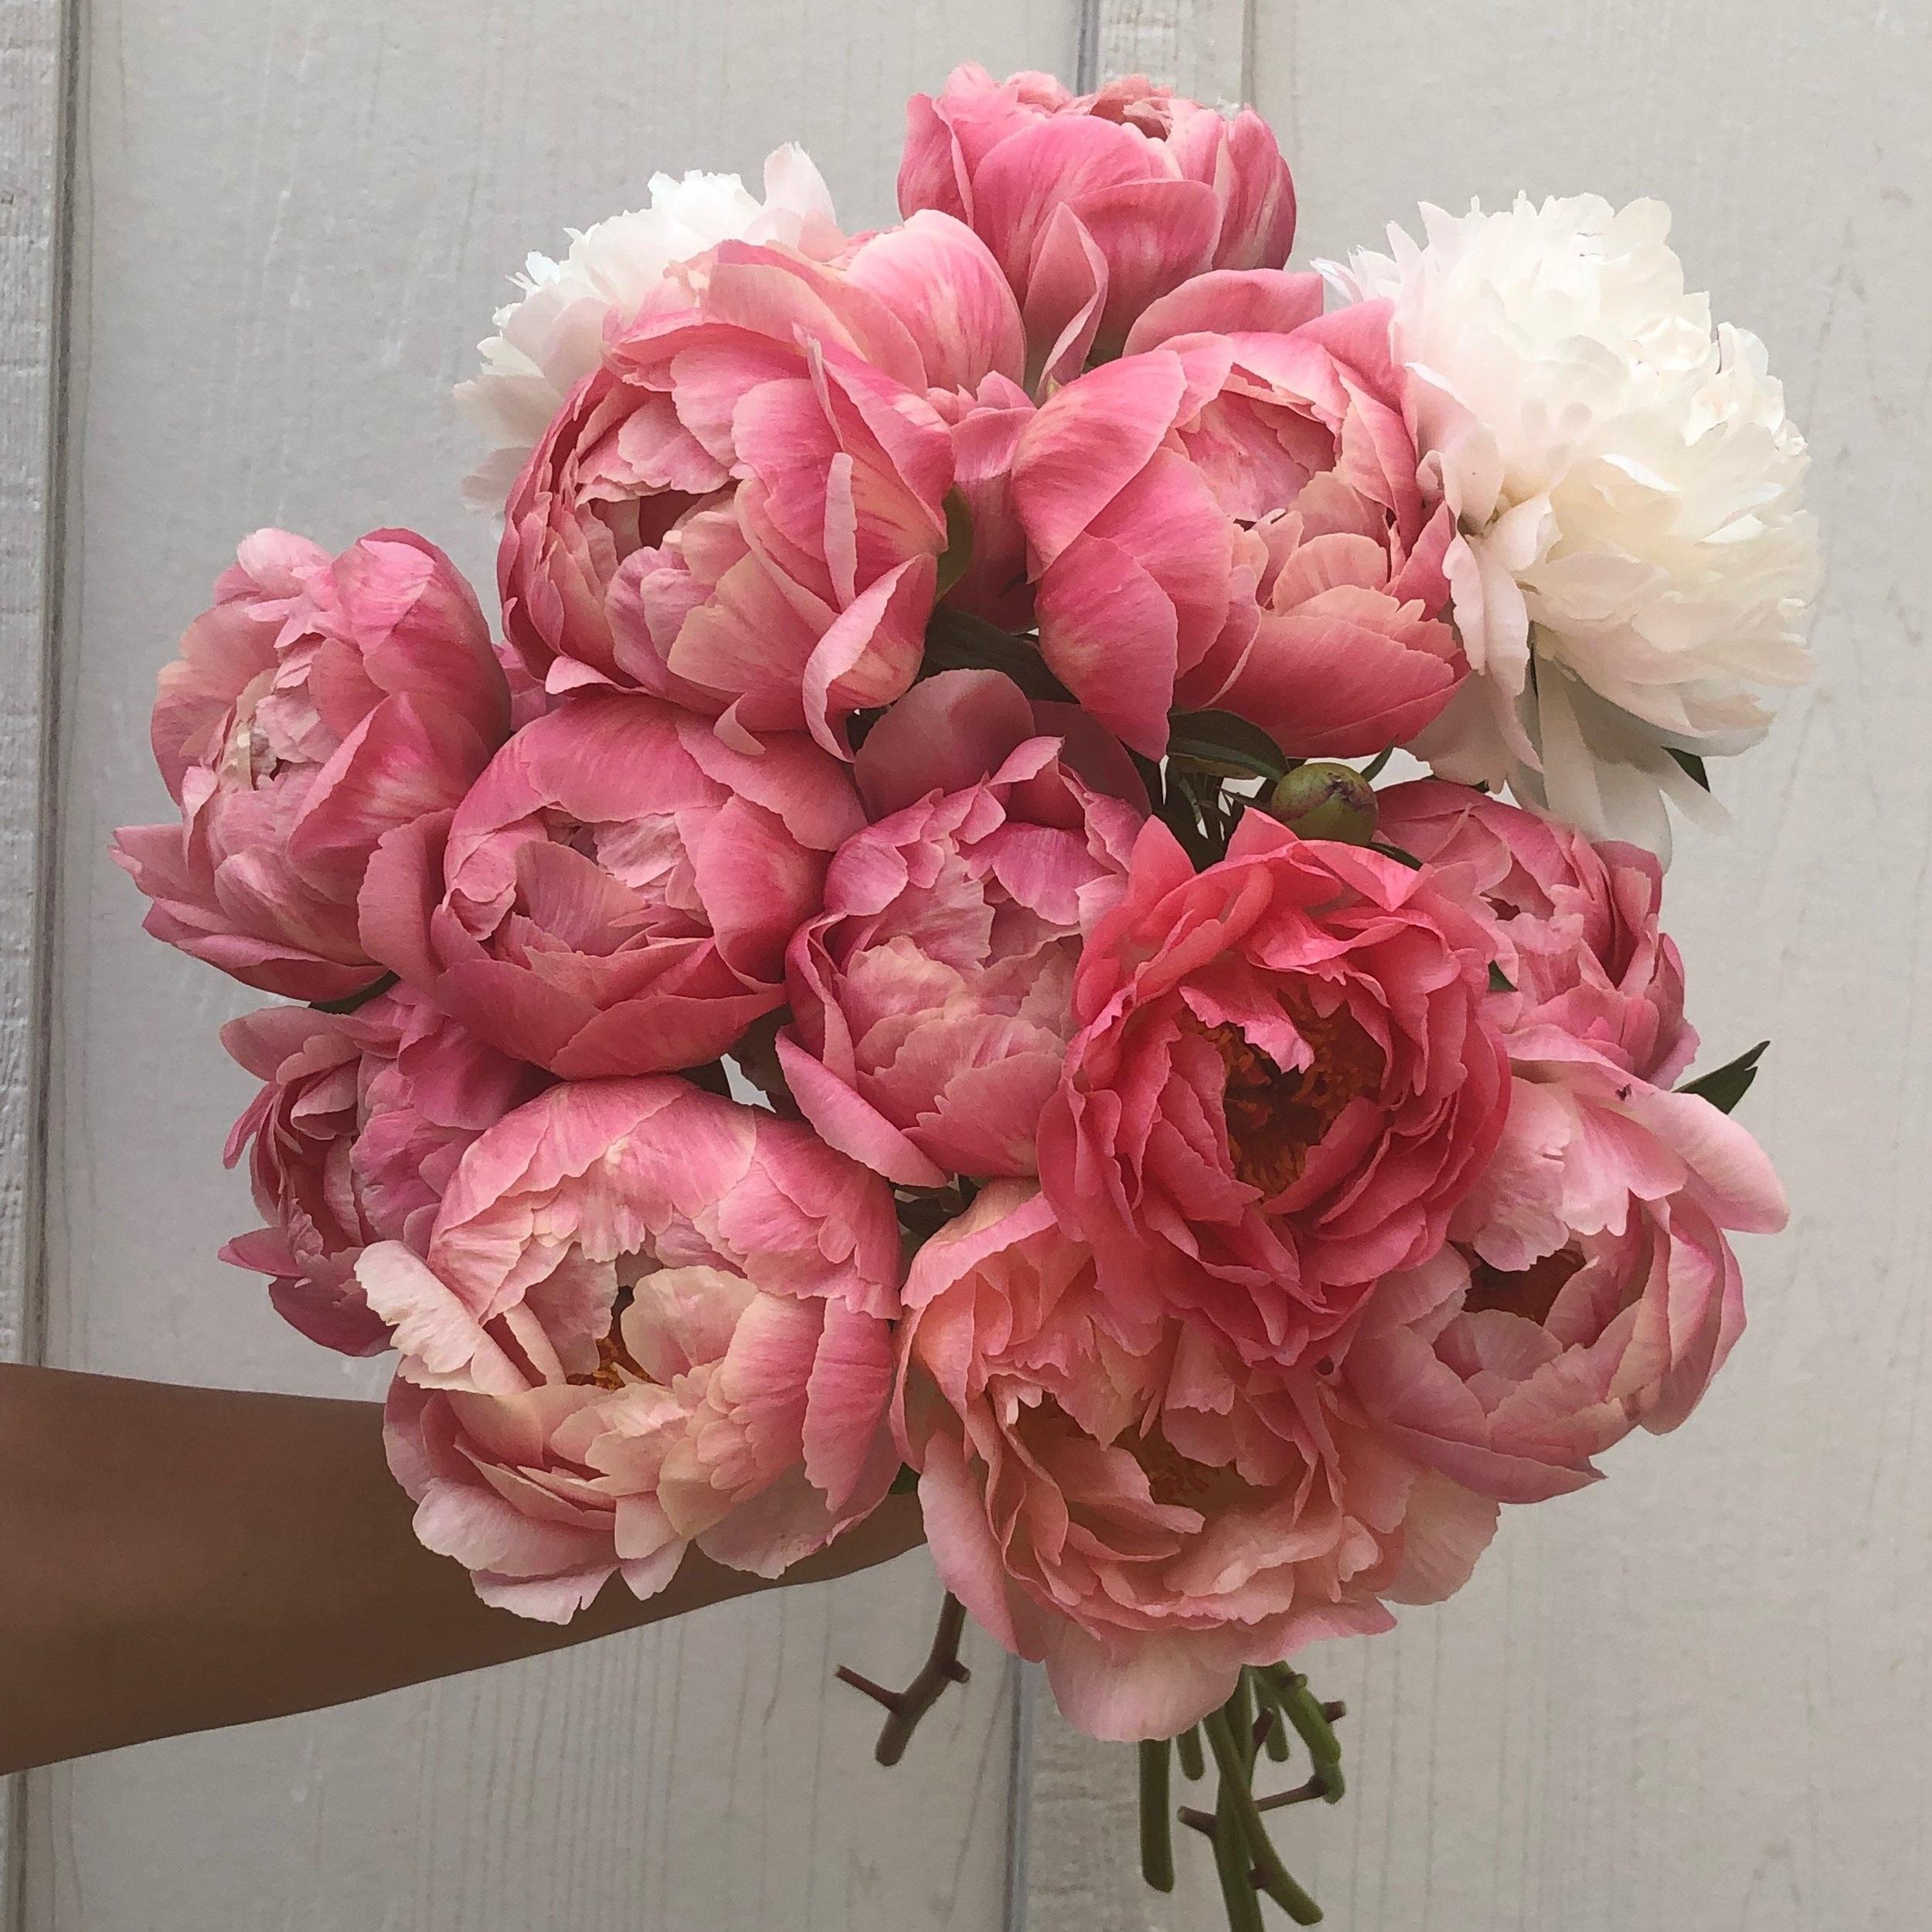 wild_flora_farm_peony_bouquet.jpg